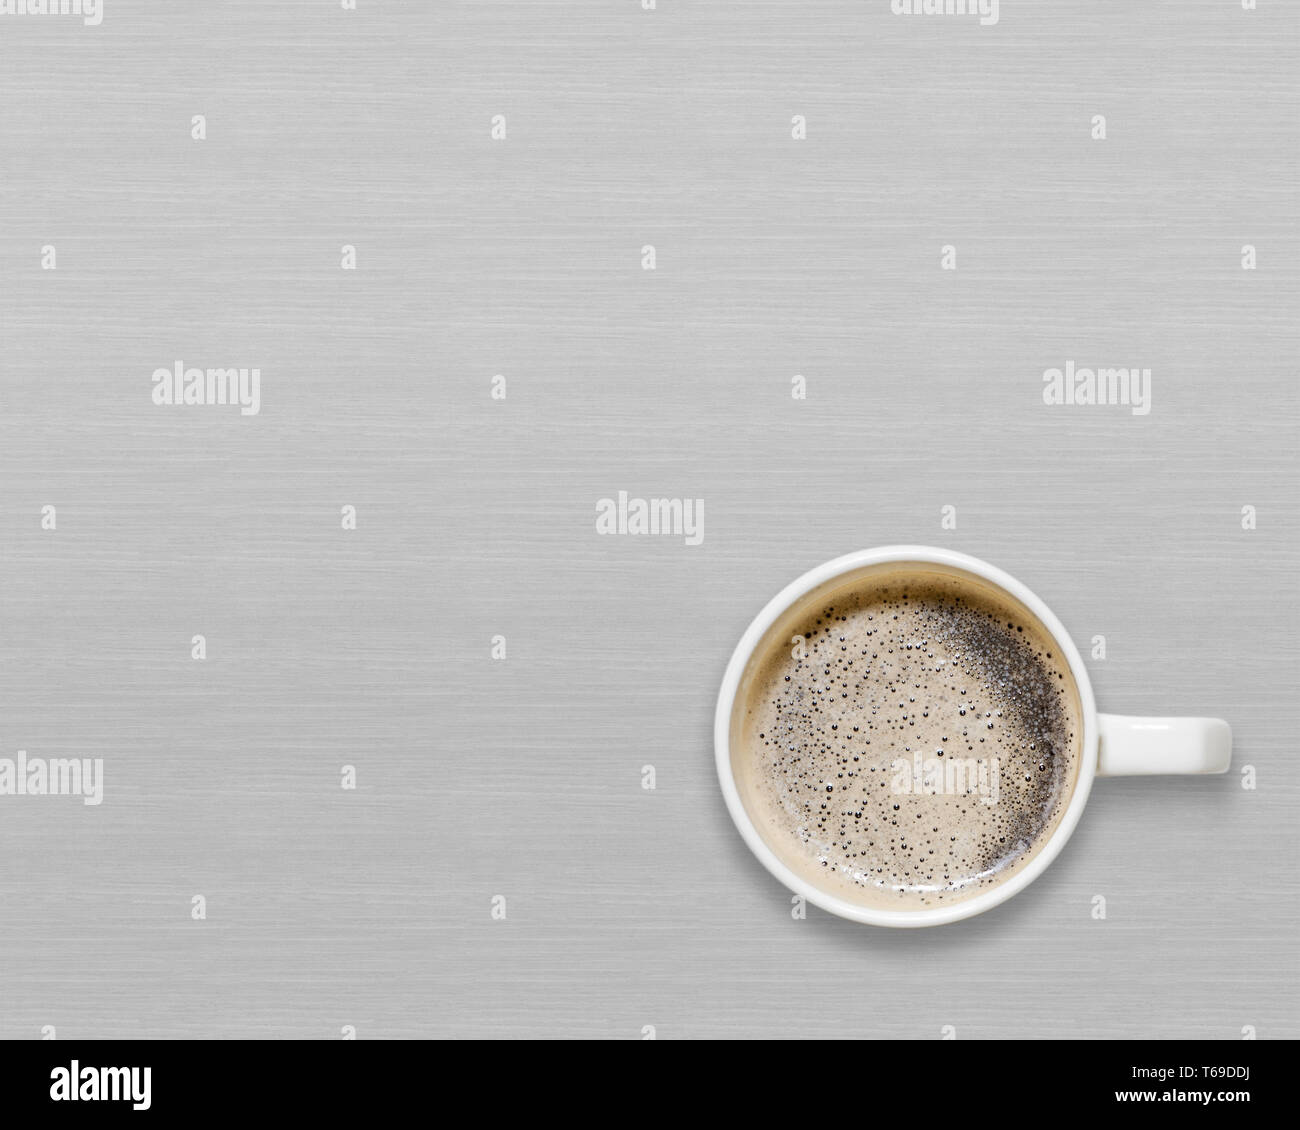 9e62b6b5614 Coffee Cup On Grey Wood Table Stock Photos & Coffee Cup On Grey Wood ...